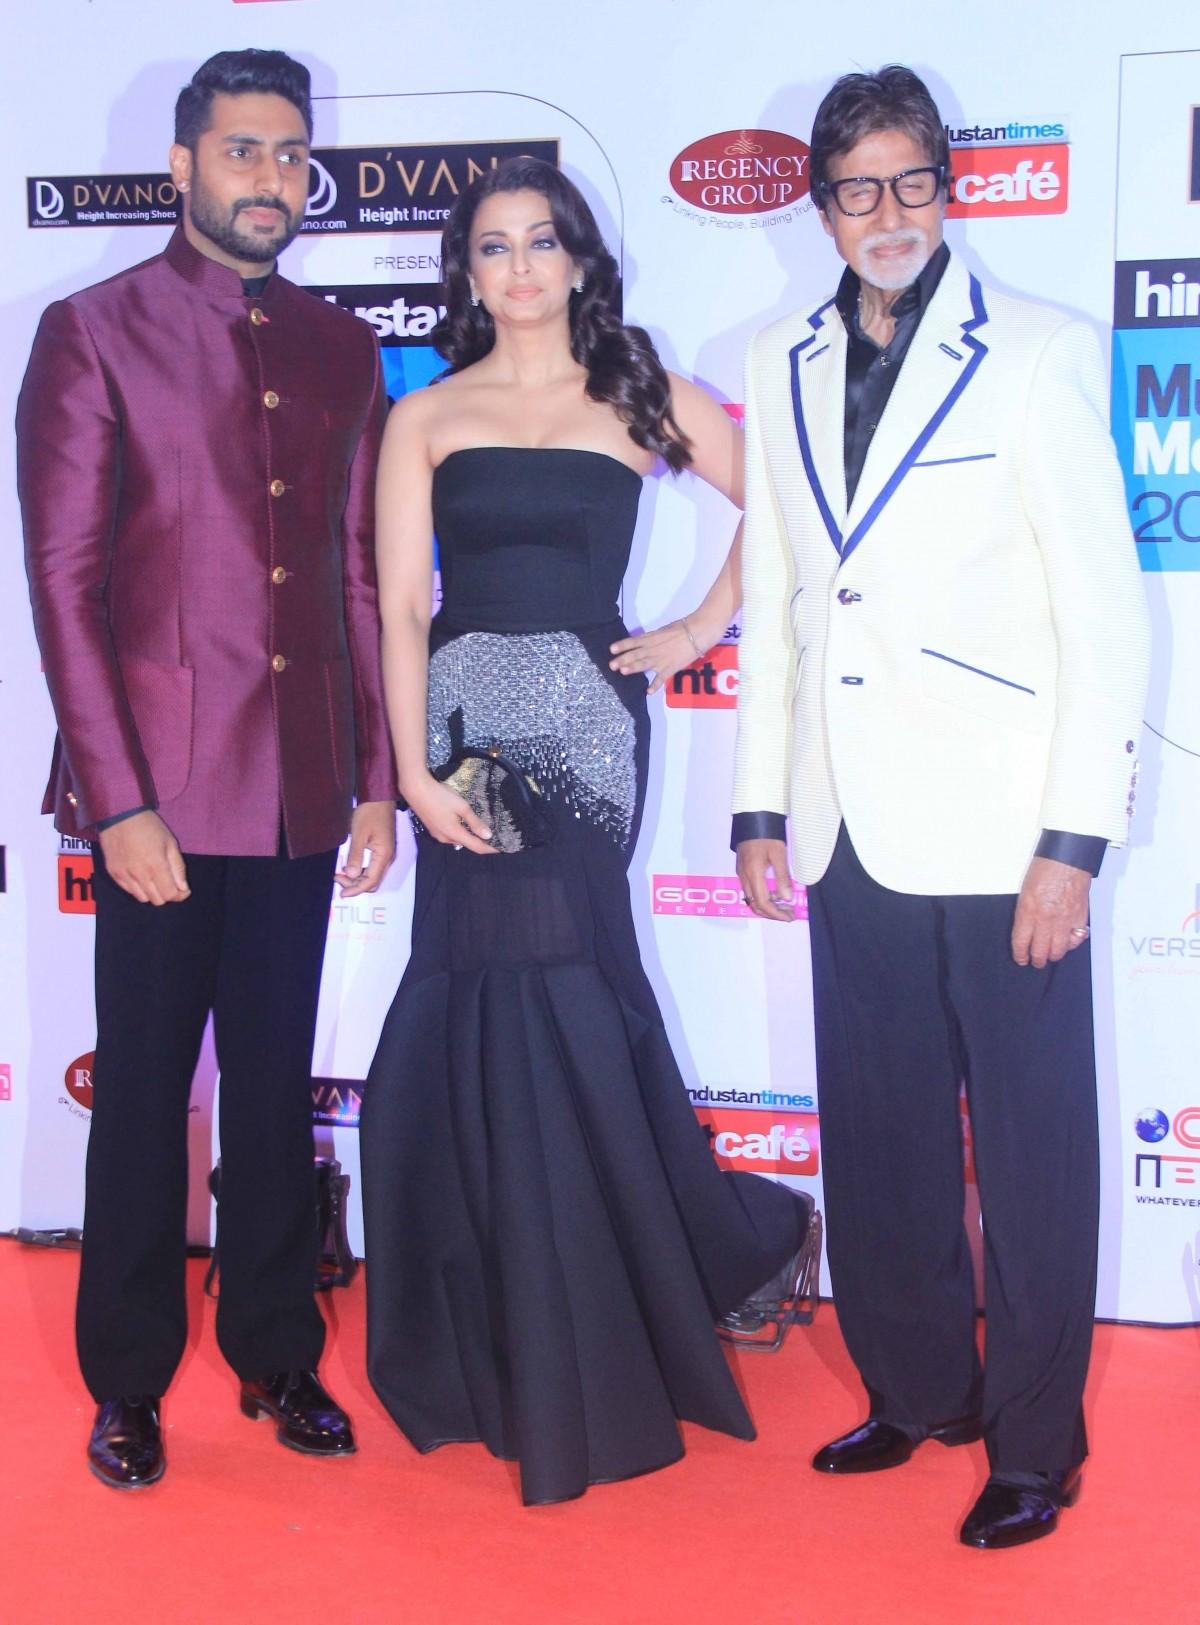 Aishwarya Rai Bachchan, Abhishek Bachchan and Amitabh Bachchan